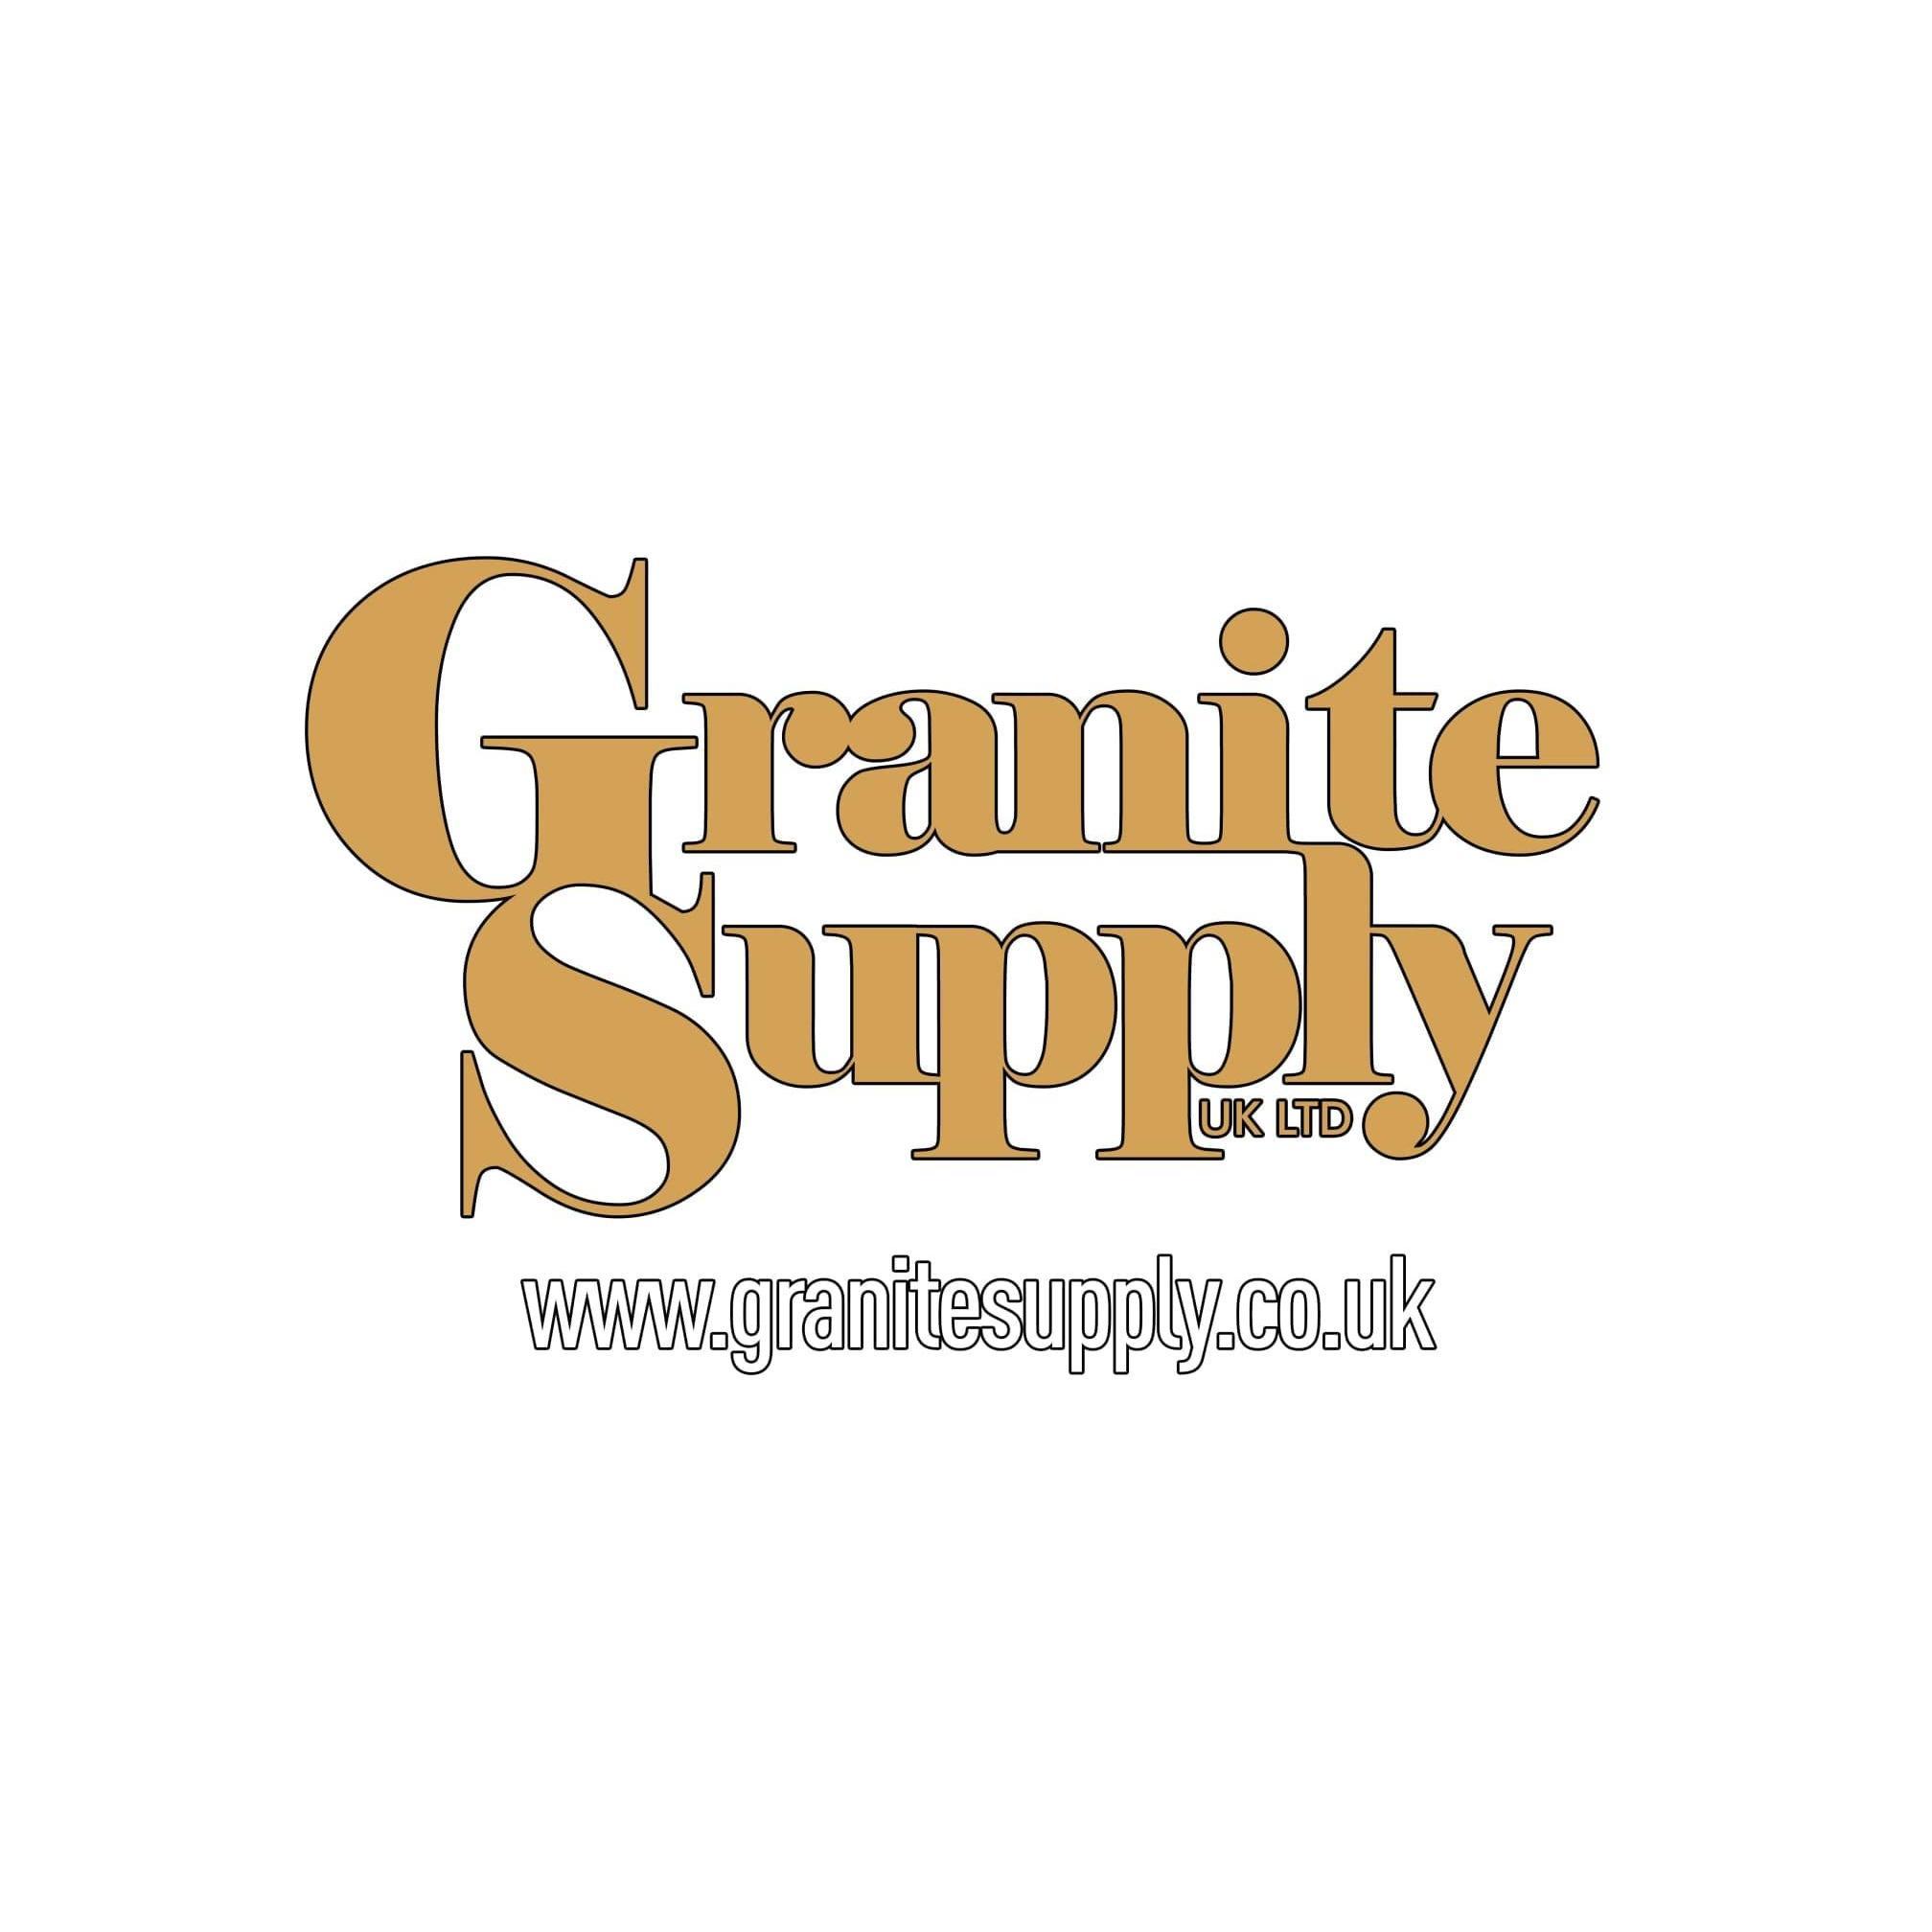 Granite Supply UK Ltd